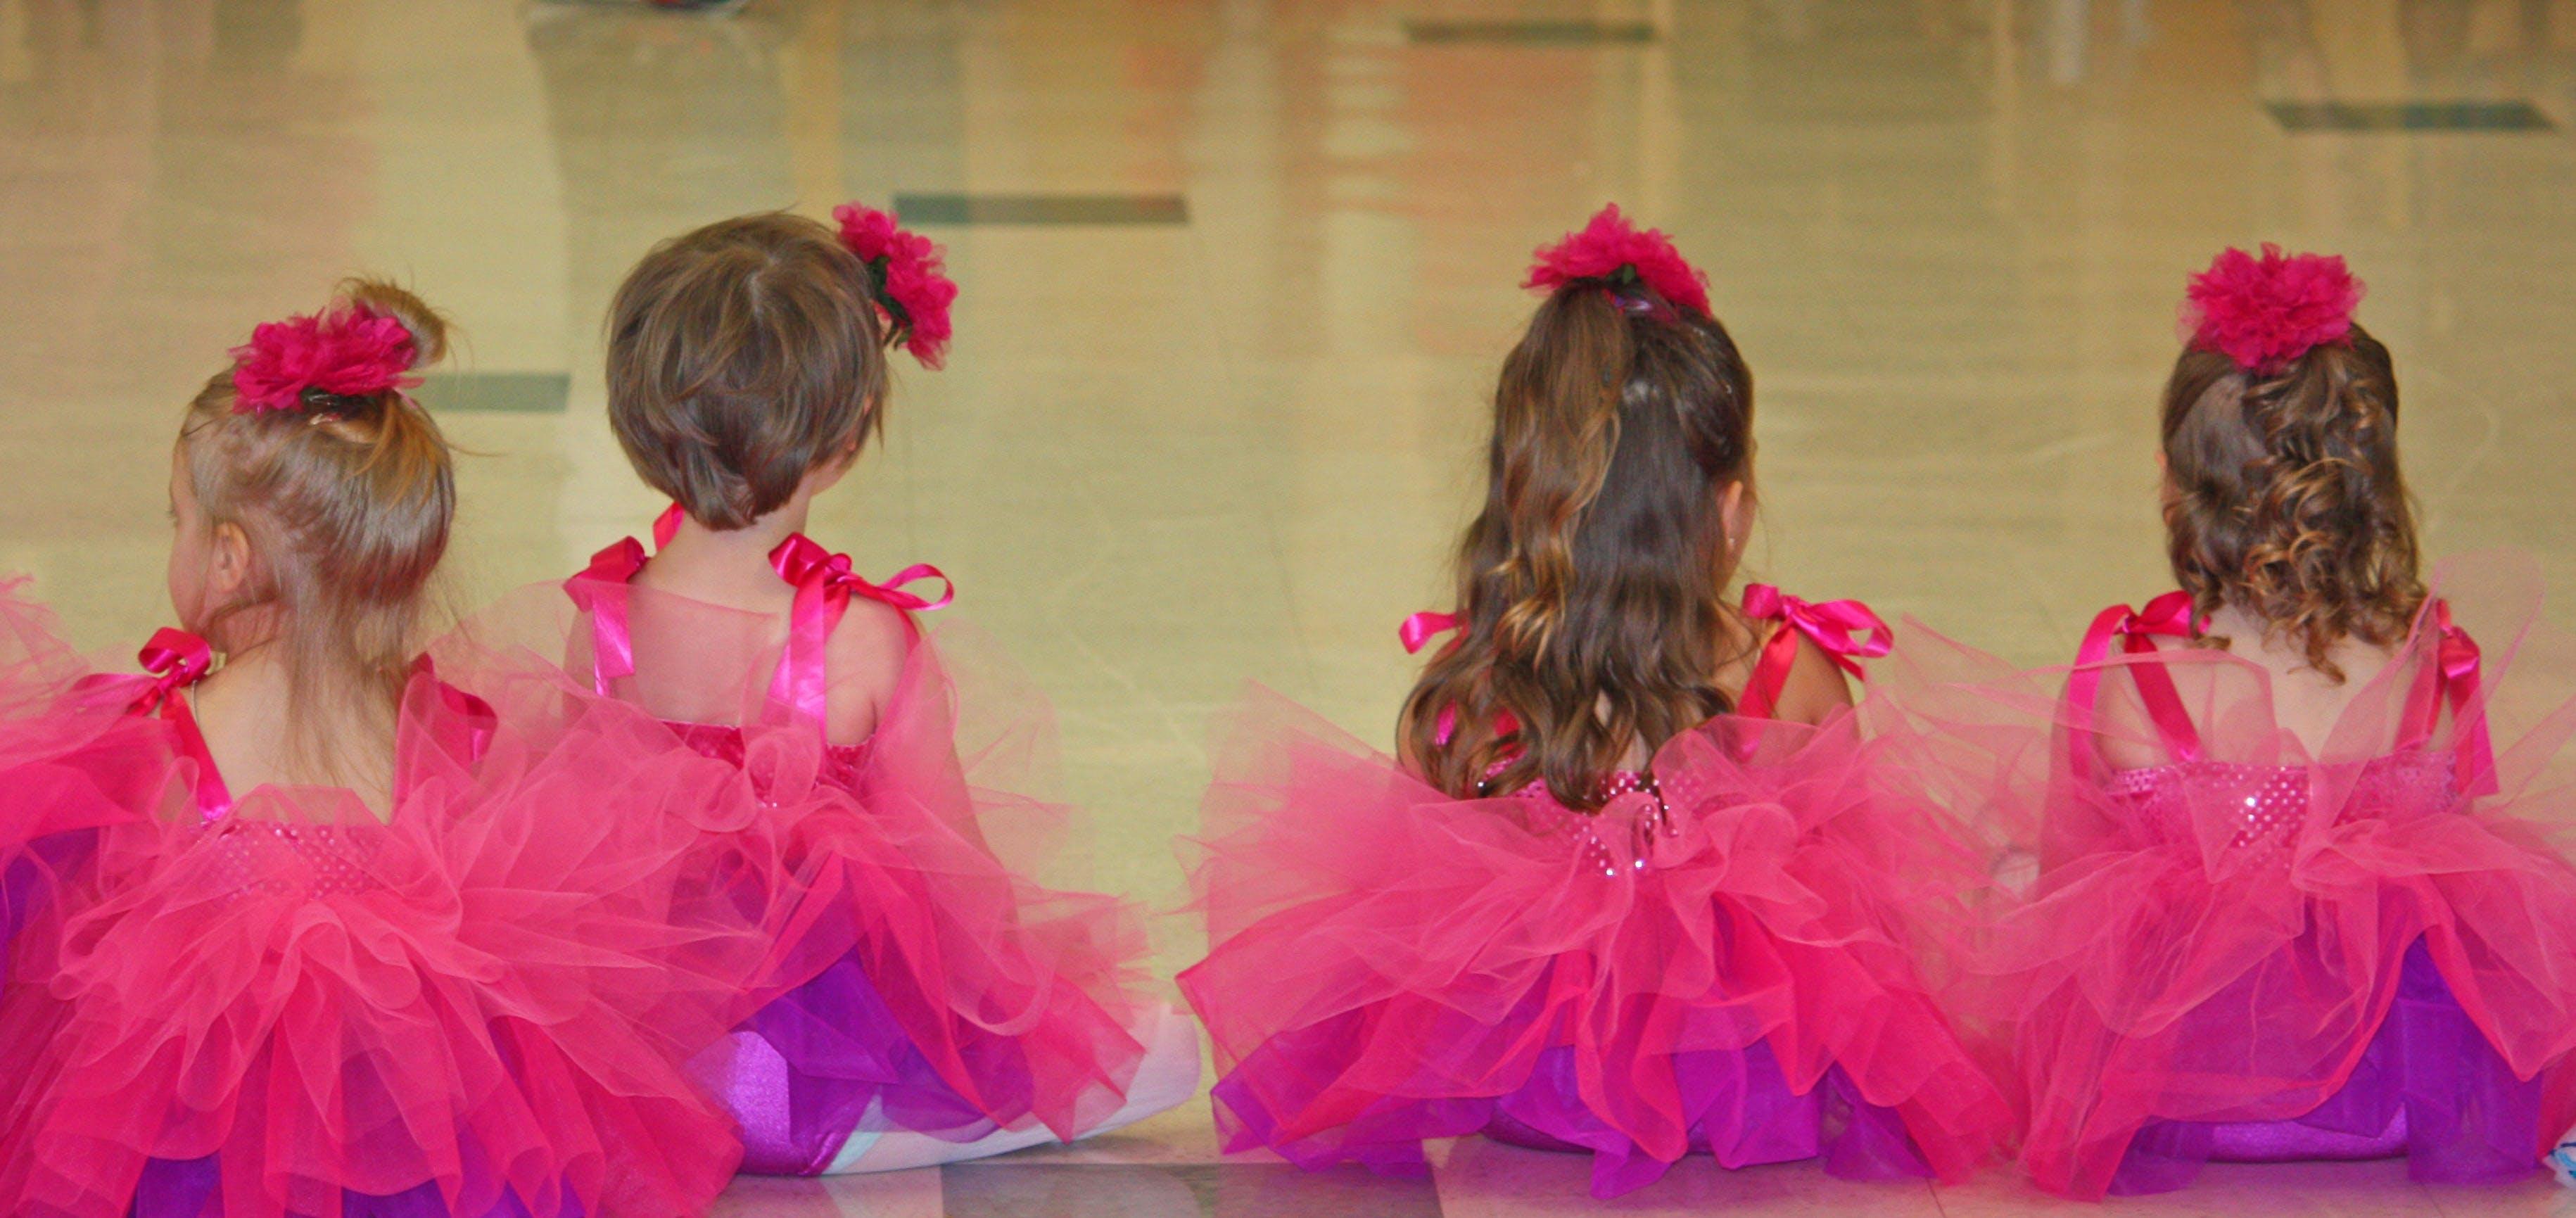 Free stock photo of ballerina, ballet, child, childhood